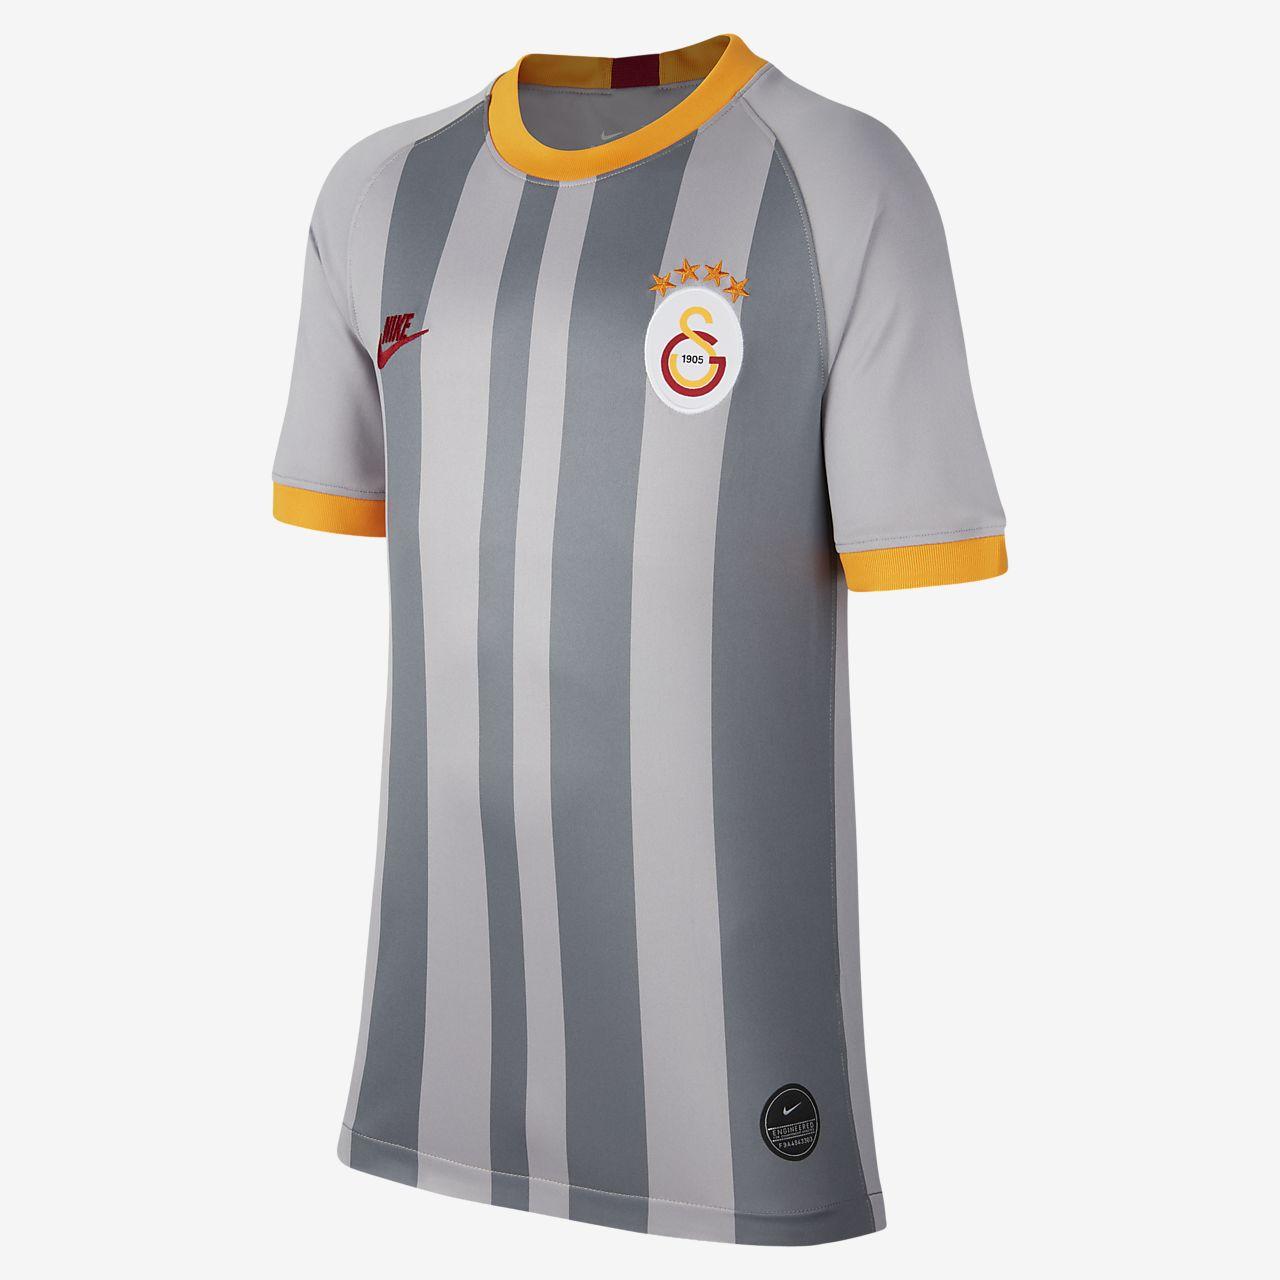 Galatasaray 2019/20 Stadium Third Older Kids' Football Shirt